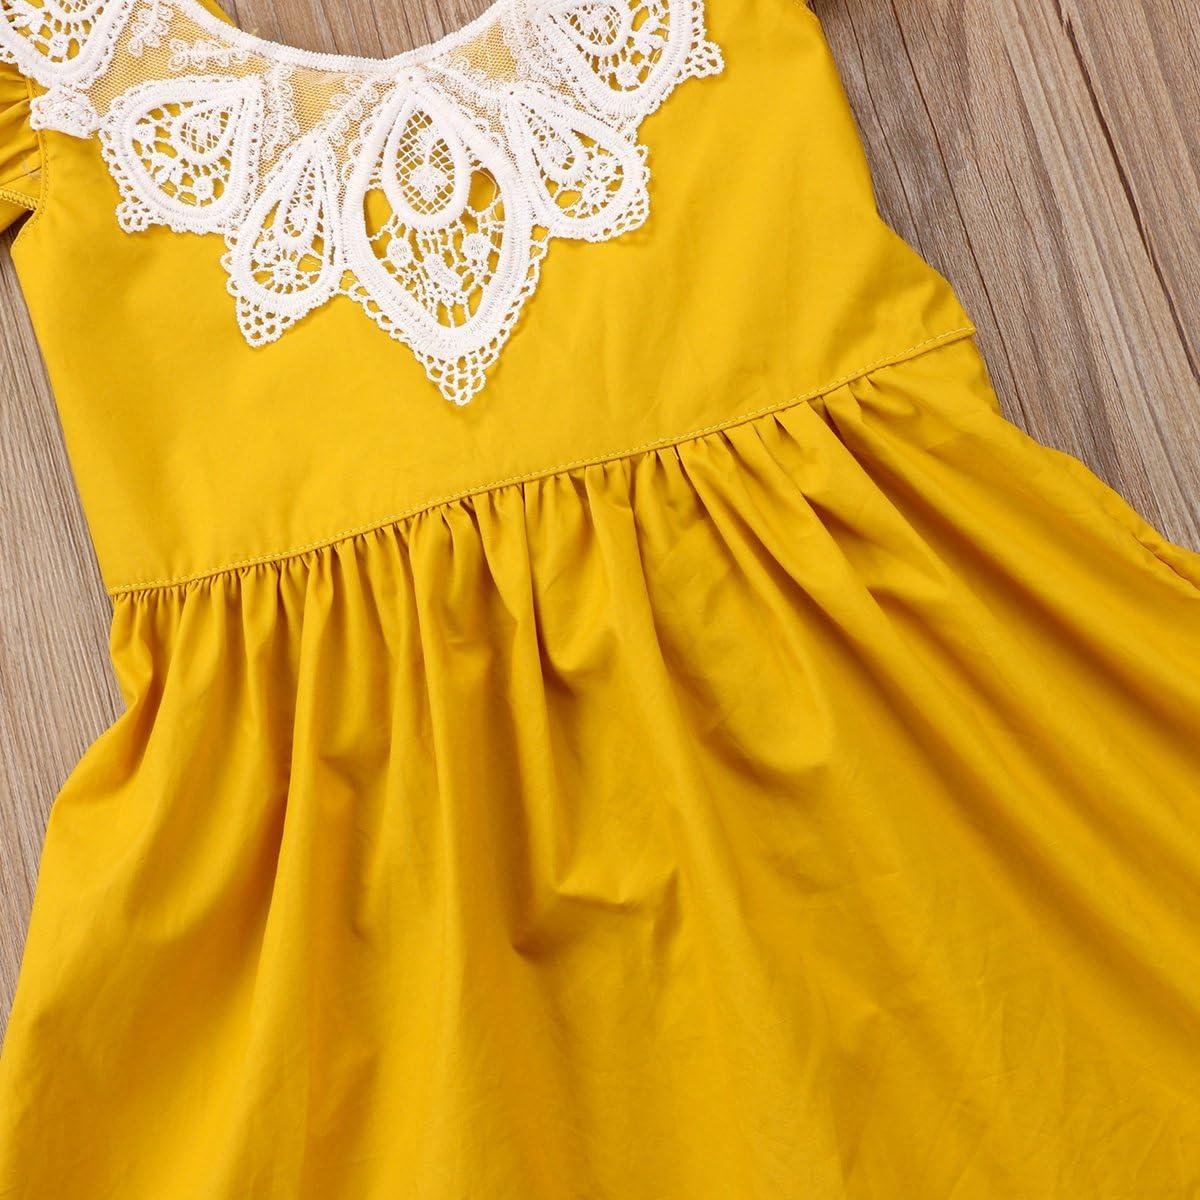 Infant Toddler Flower Girl Romper Lace Collar Cotton Ruffle Sleeve Baby Girls Spring Dresses